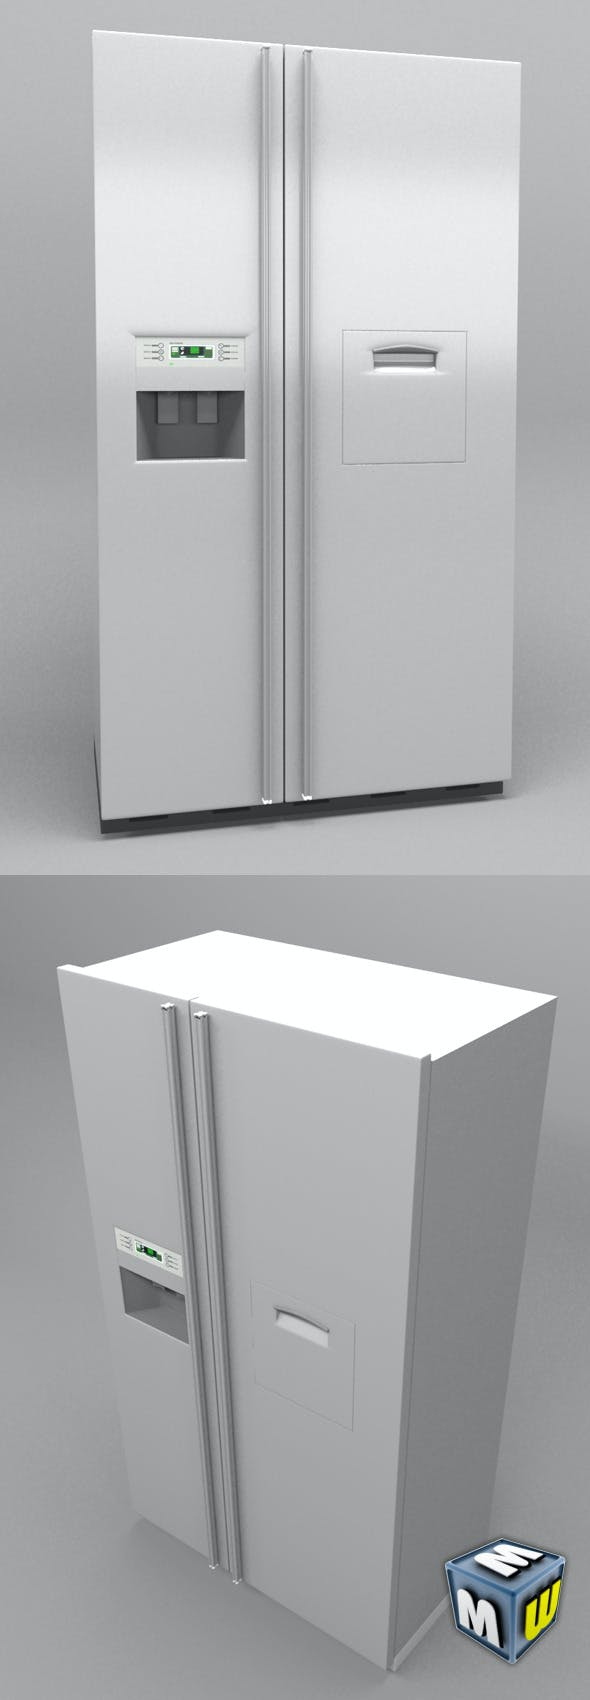 Refrigerator Kitchen - 3DOcean Item for Sale